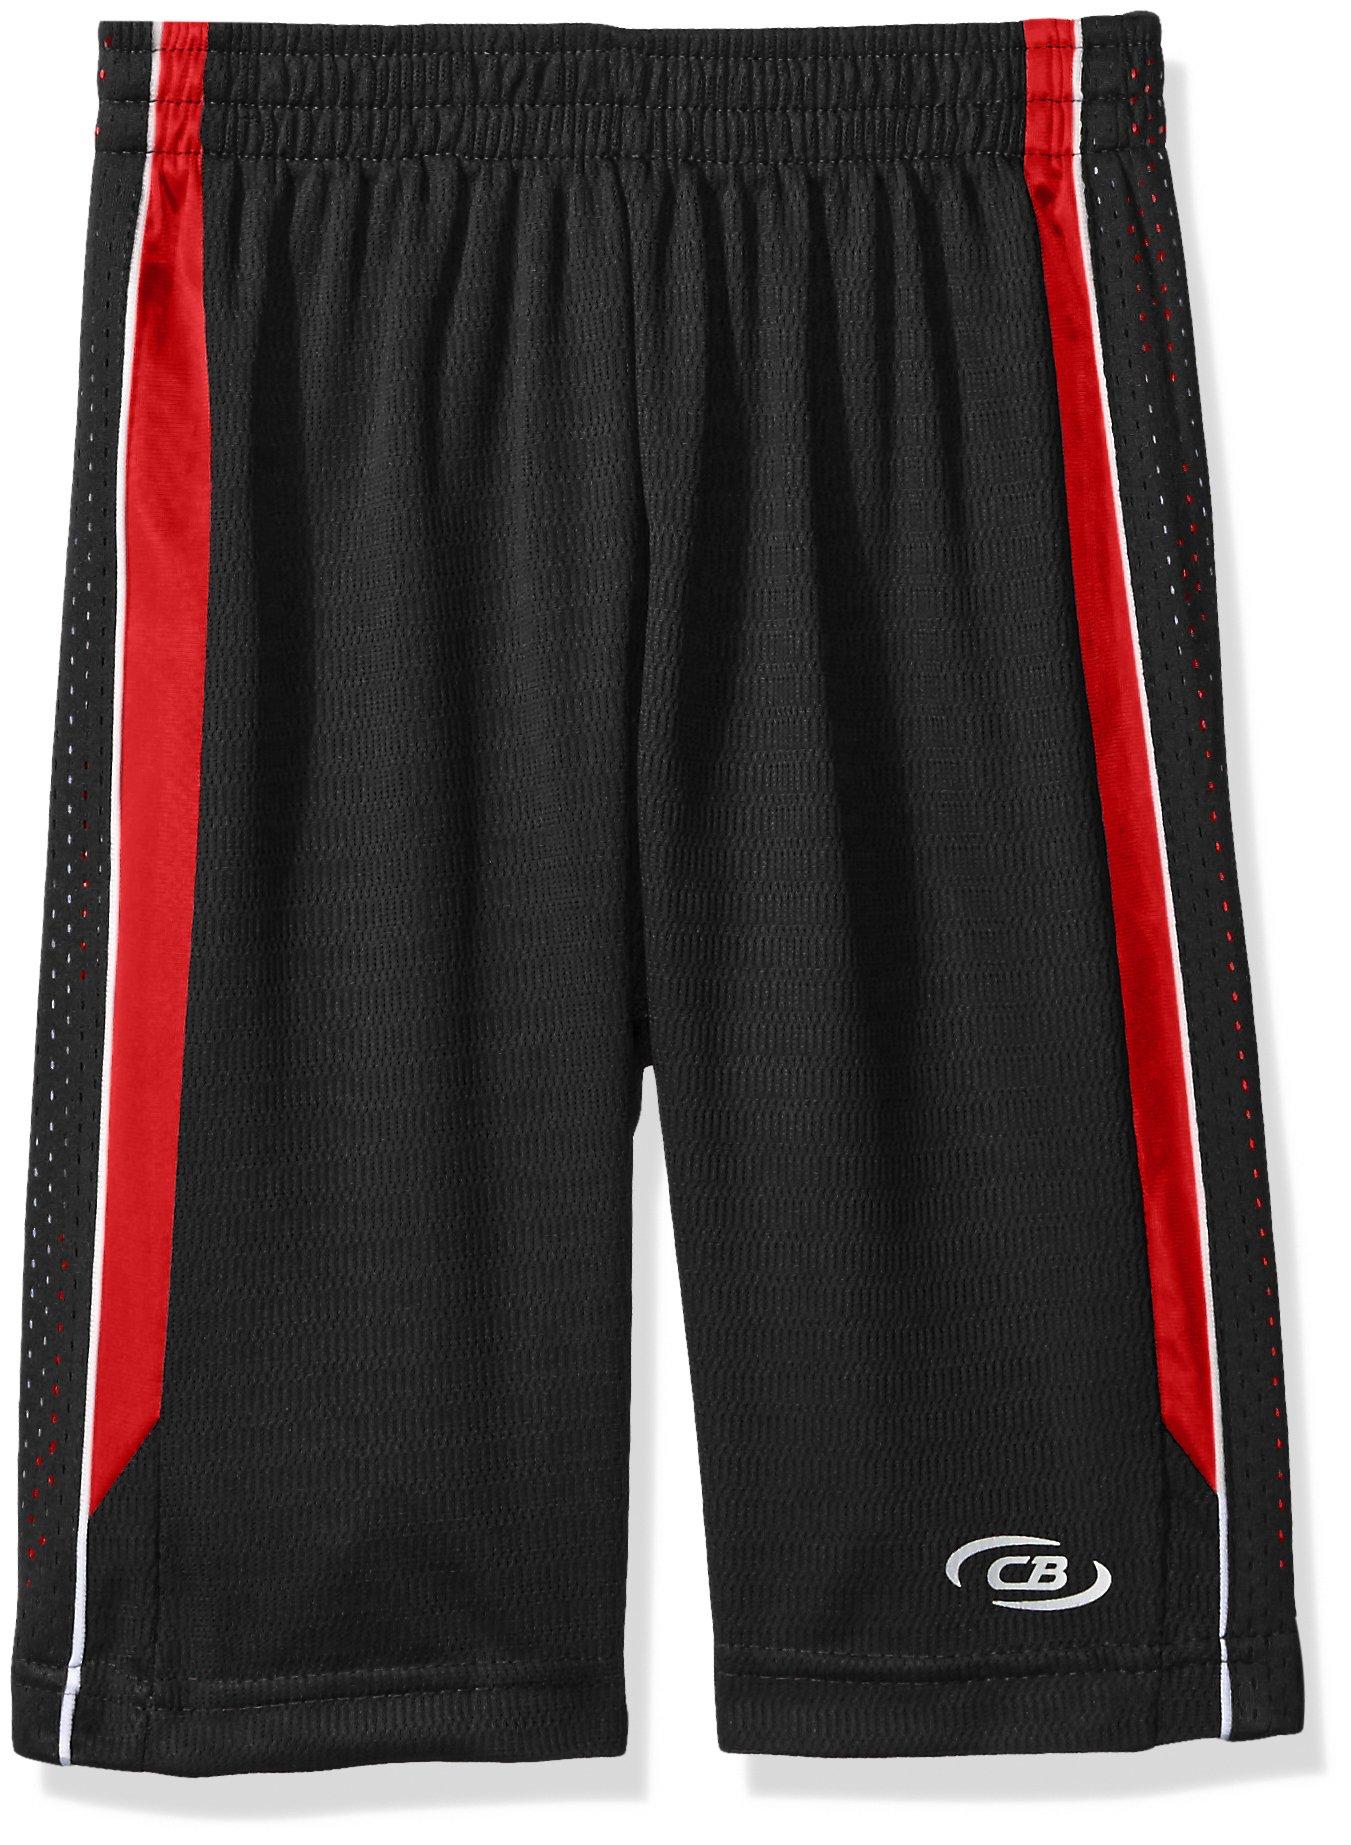 CB Sports Little Boys' Mesh Athletic Short, TL83-Engine Red, 4